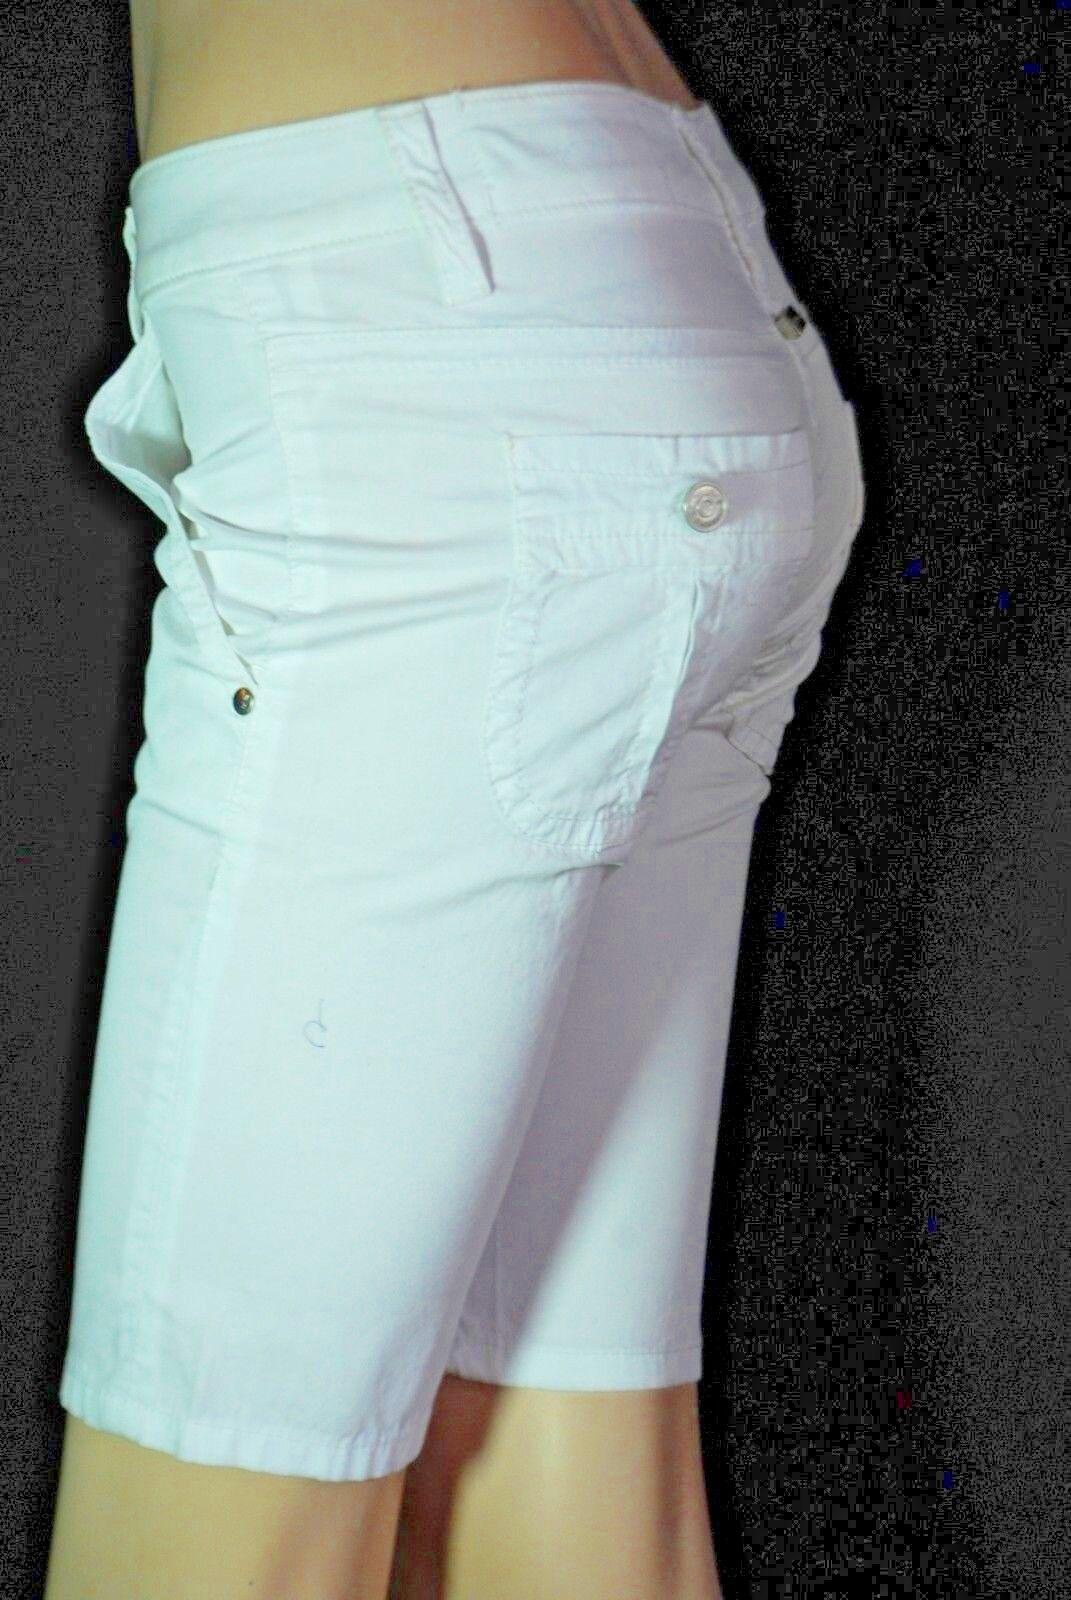 X Stone Bermudas Hose trousers white weiß SHORTS W26 XS 34 36 neu